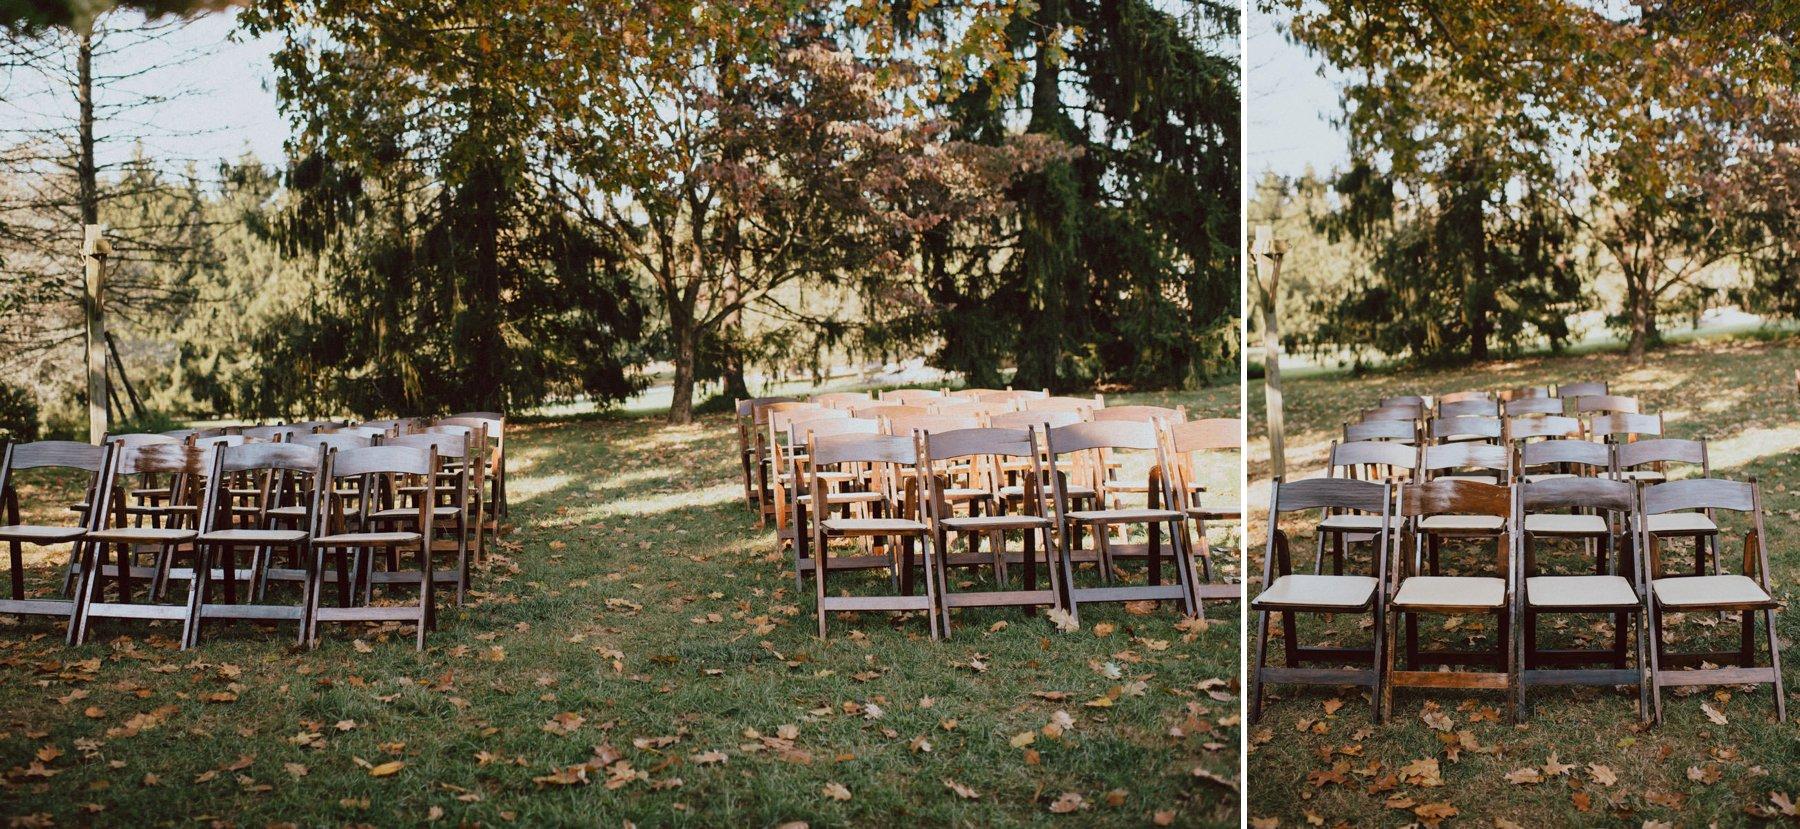 faunbrook-bed-and-breakfast-wedding-46.jpg